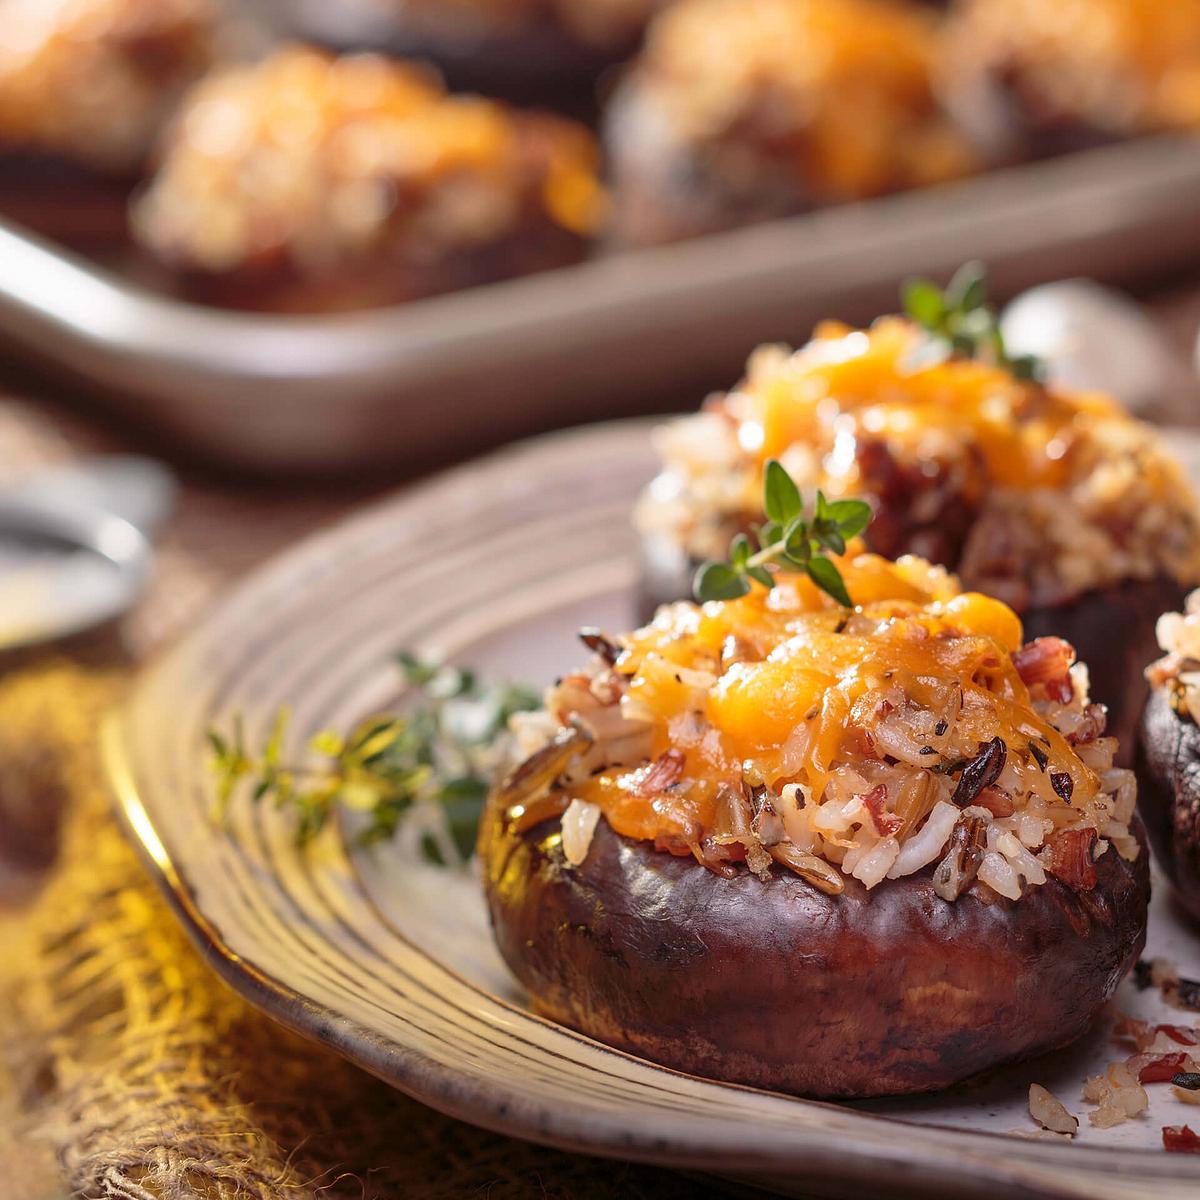 Wild Rice & Sausage Stuffed Mushrooms Recipe